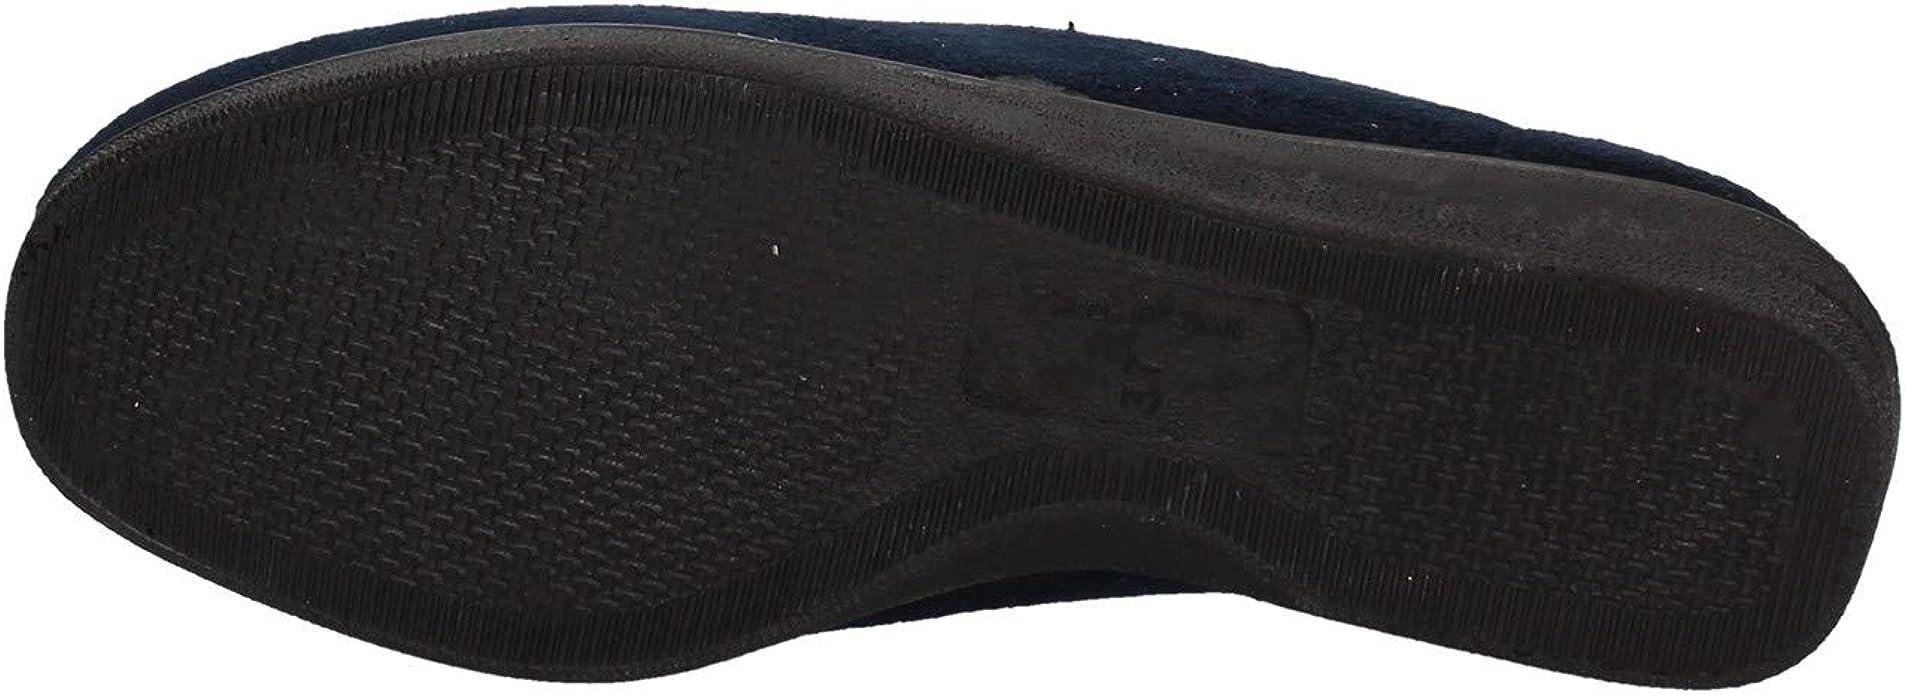 VALLEVERDE 23225 pantofola mocassini scarpe donna panno blu